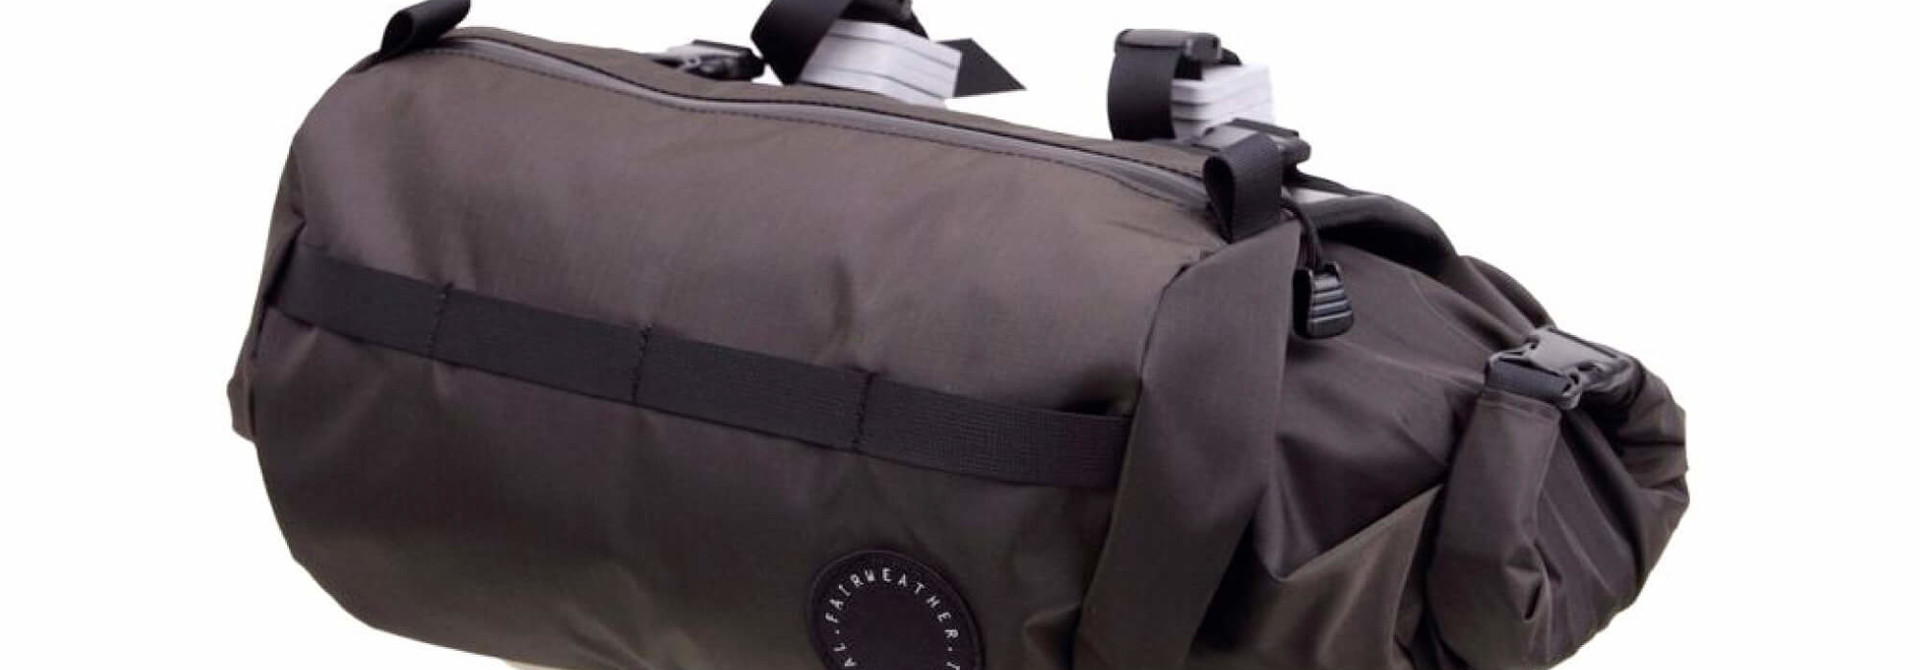 Handlebar Bag+